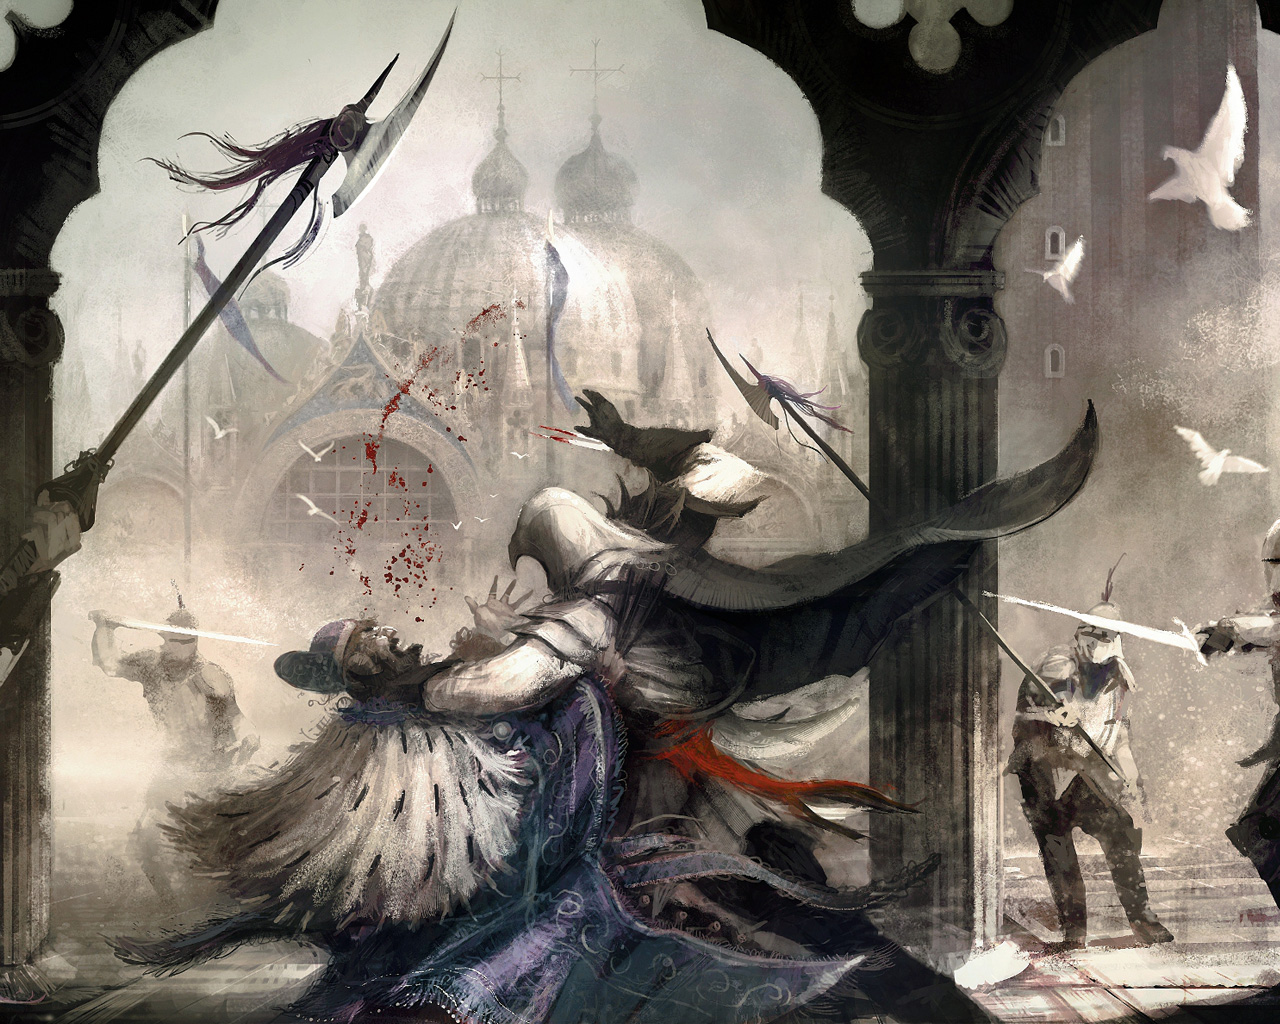 Assassin's Creed II Wallpaper in 1280x1024